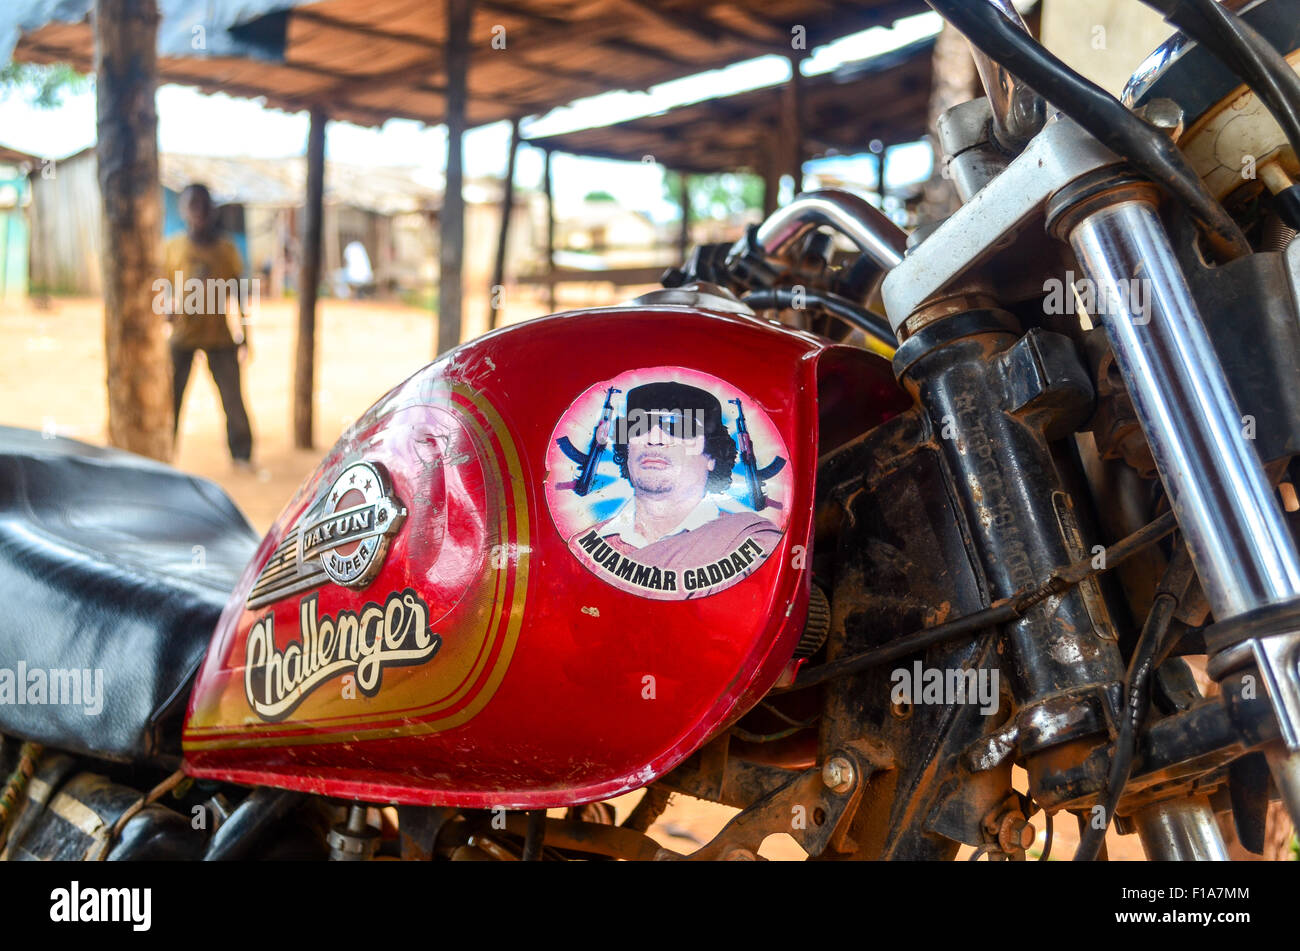 Sticker of Mouammar Gaddafi on a motorbike in Ivory Coast - Stock Image